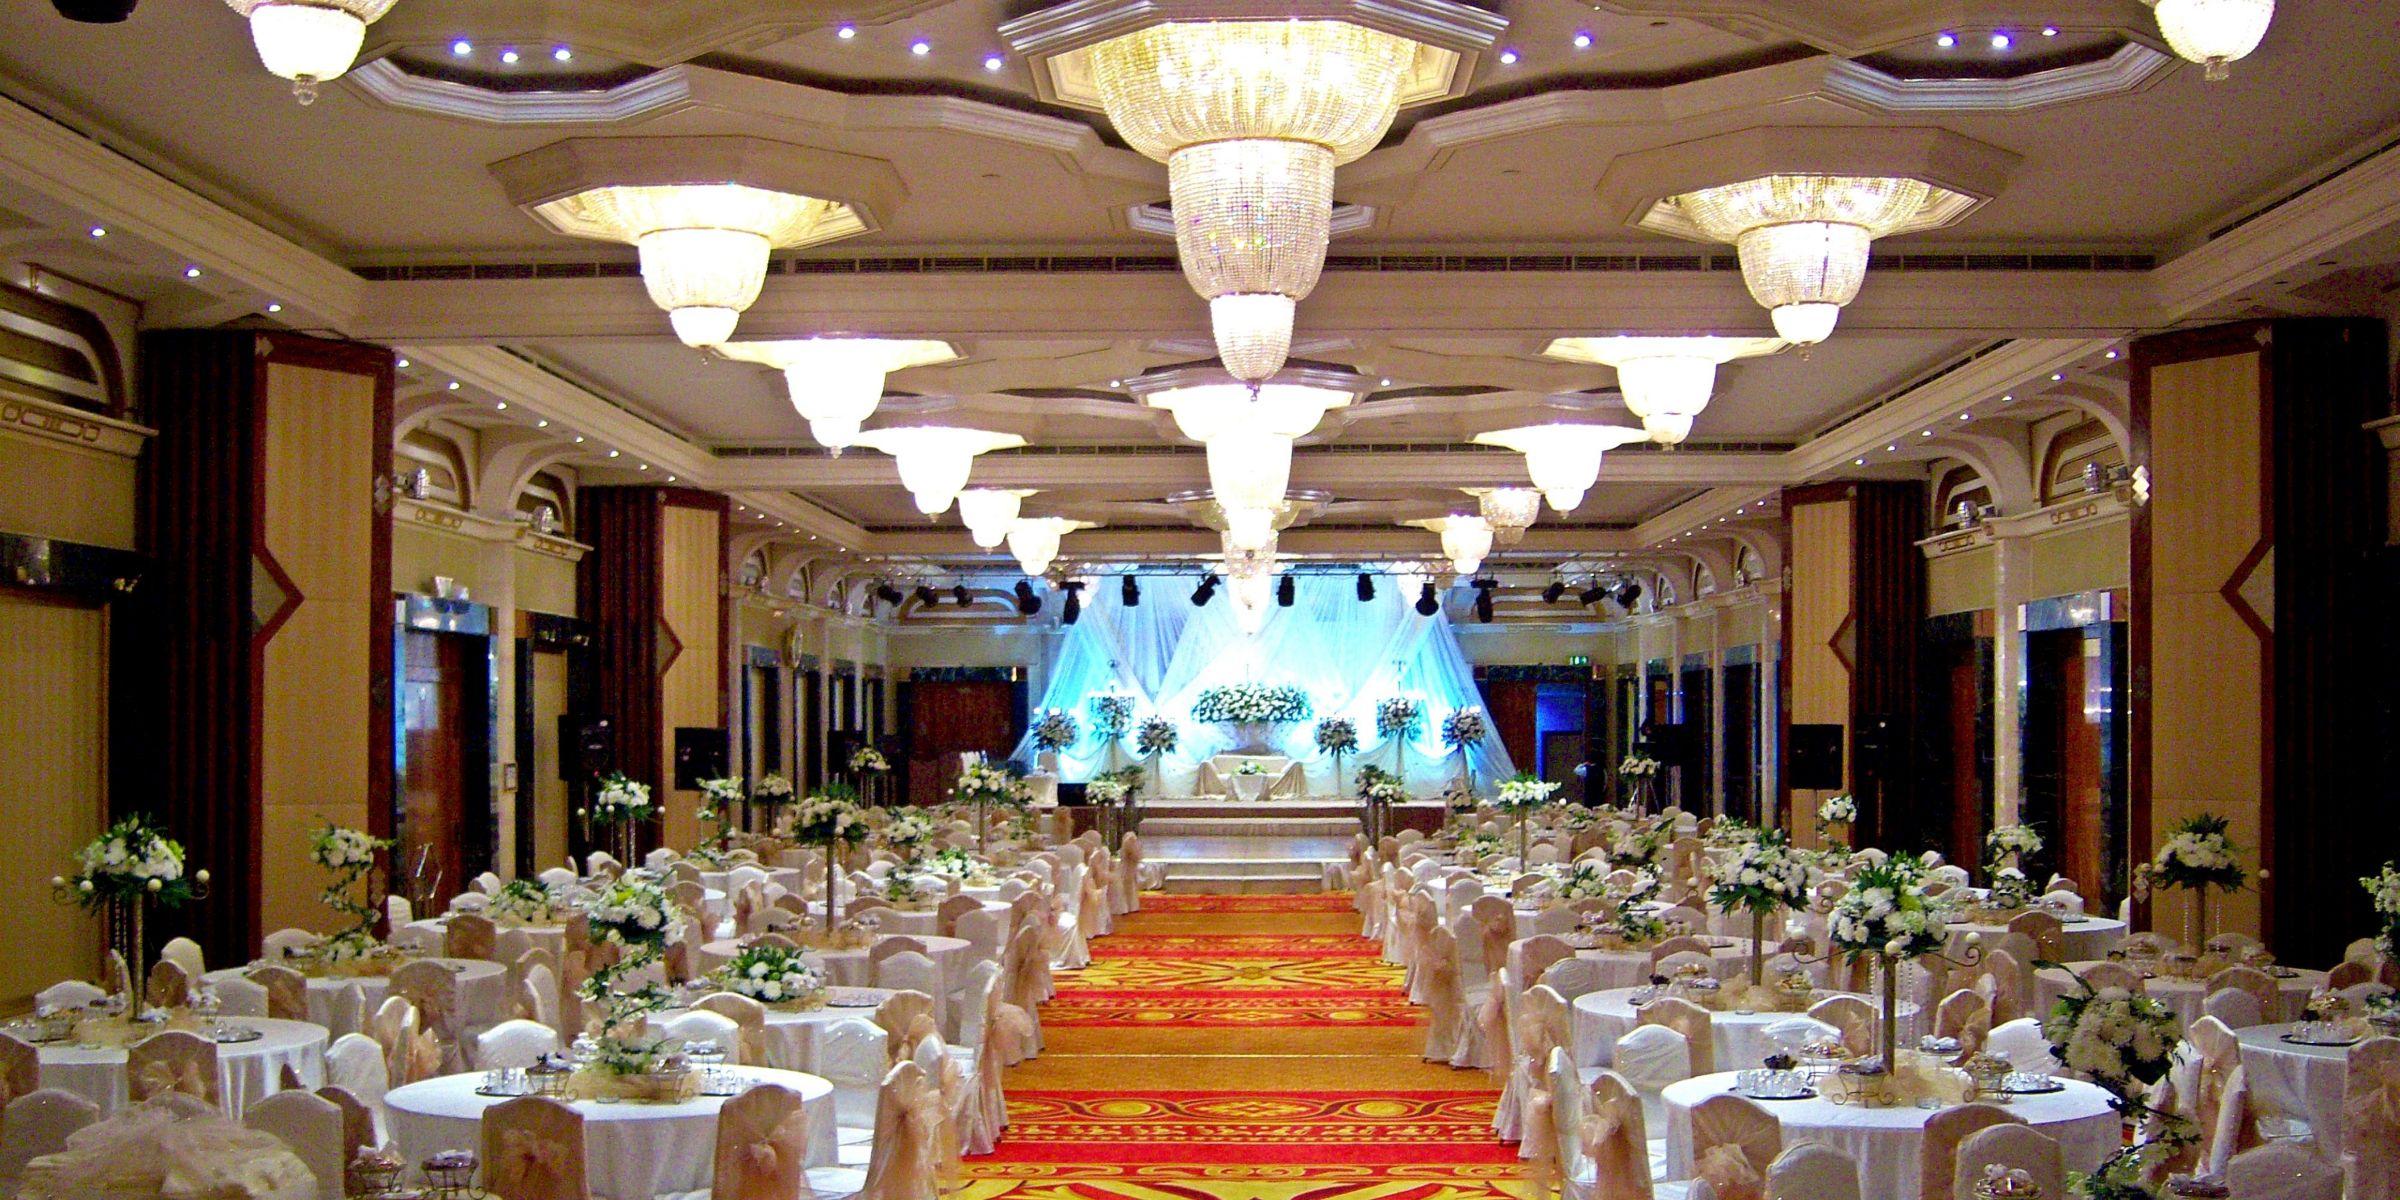 Intercontinental jeddah hotel meeting rooms wedding rentals salo de eventos sala para banquetes junglespirit Image collections